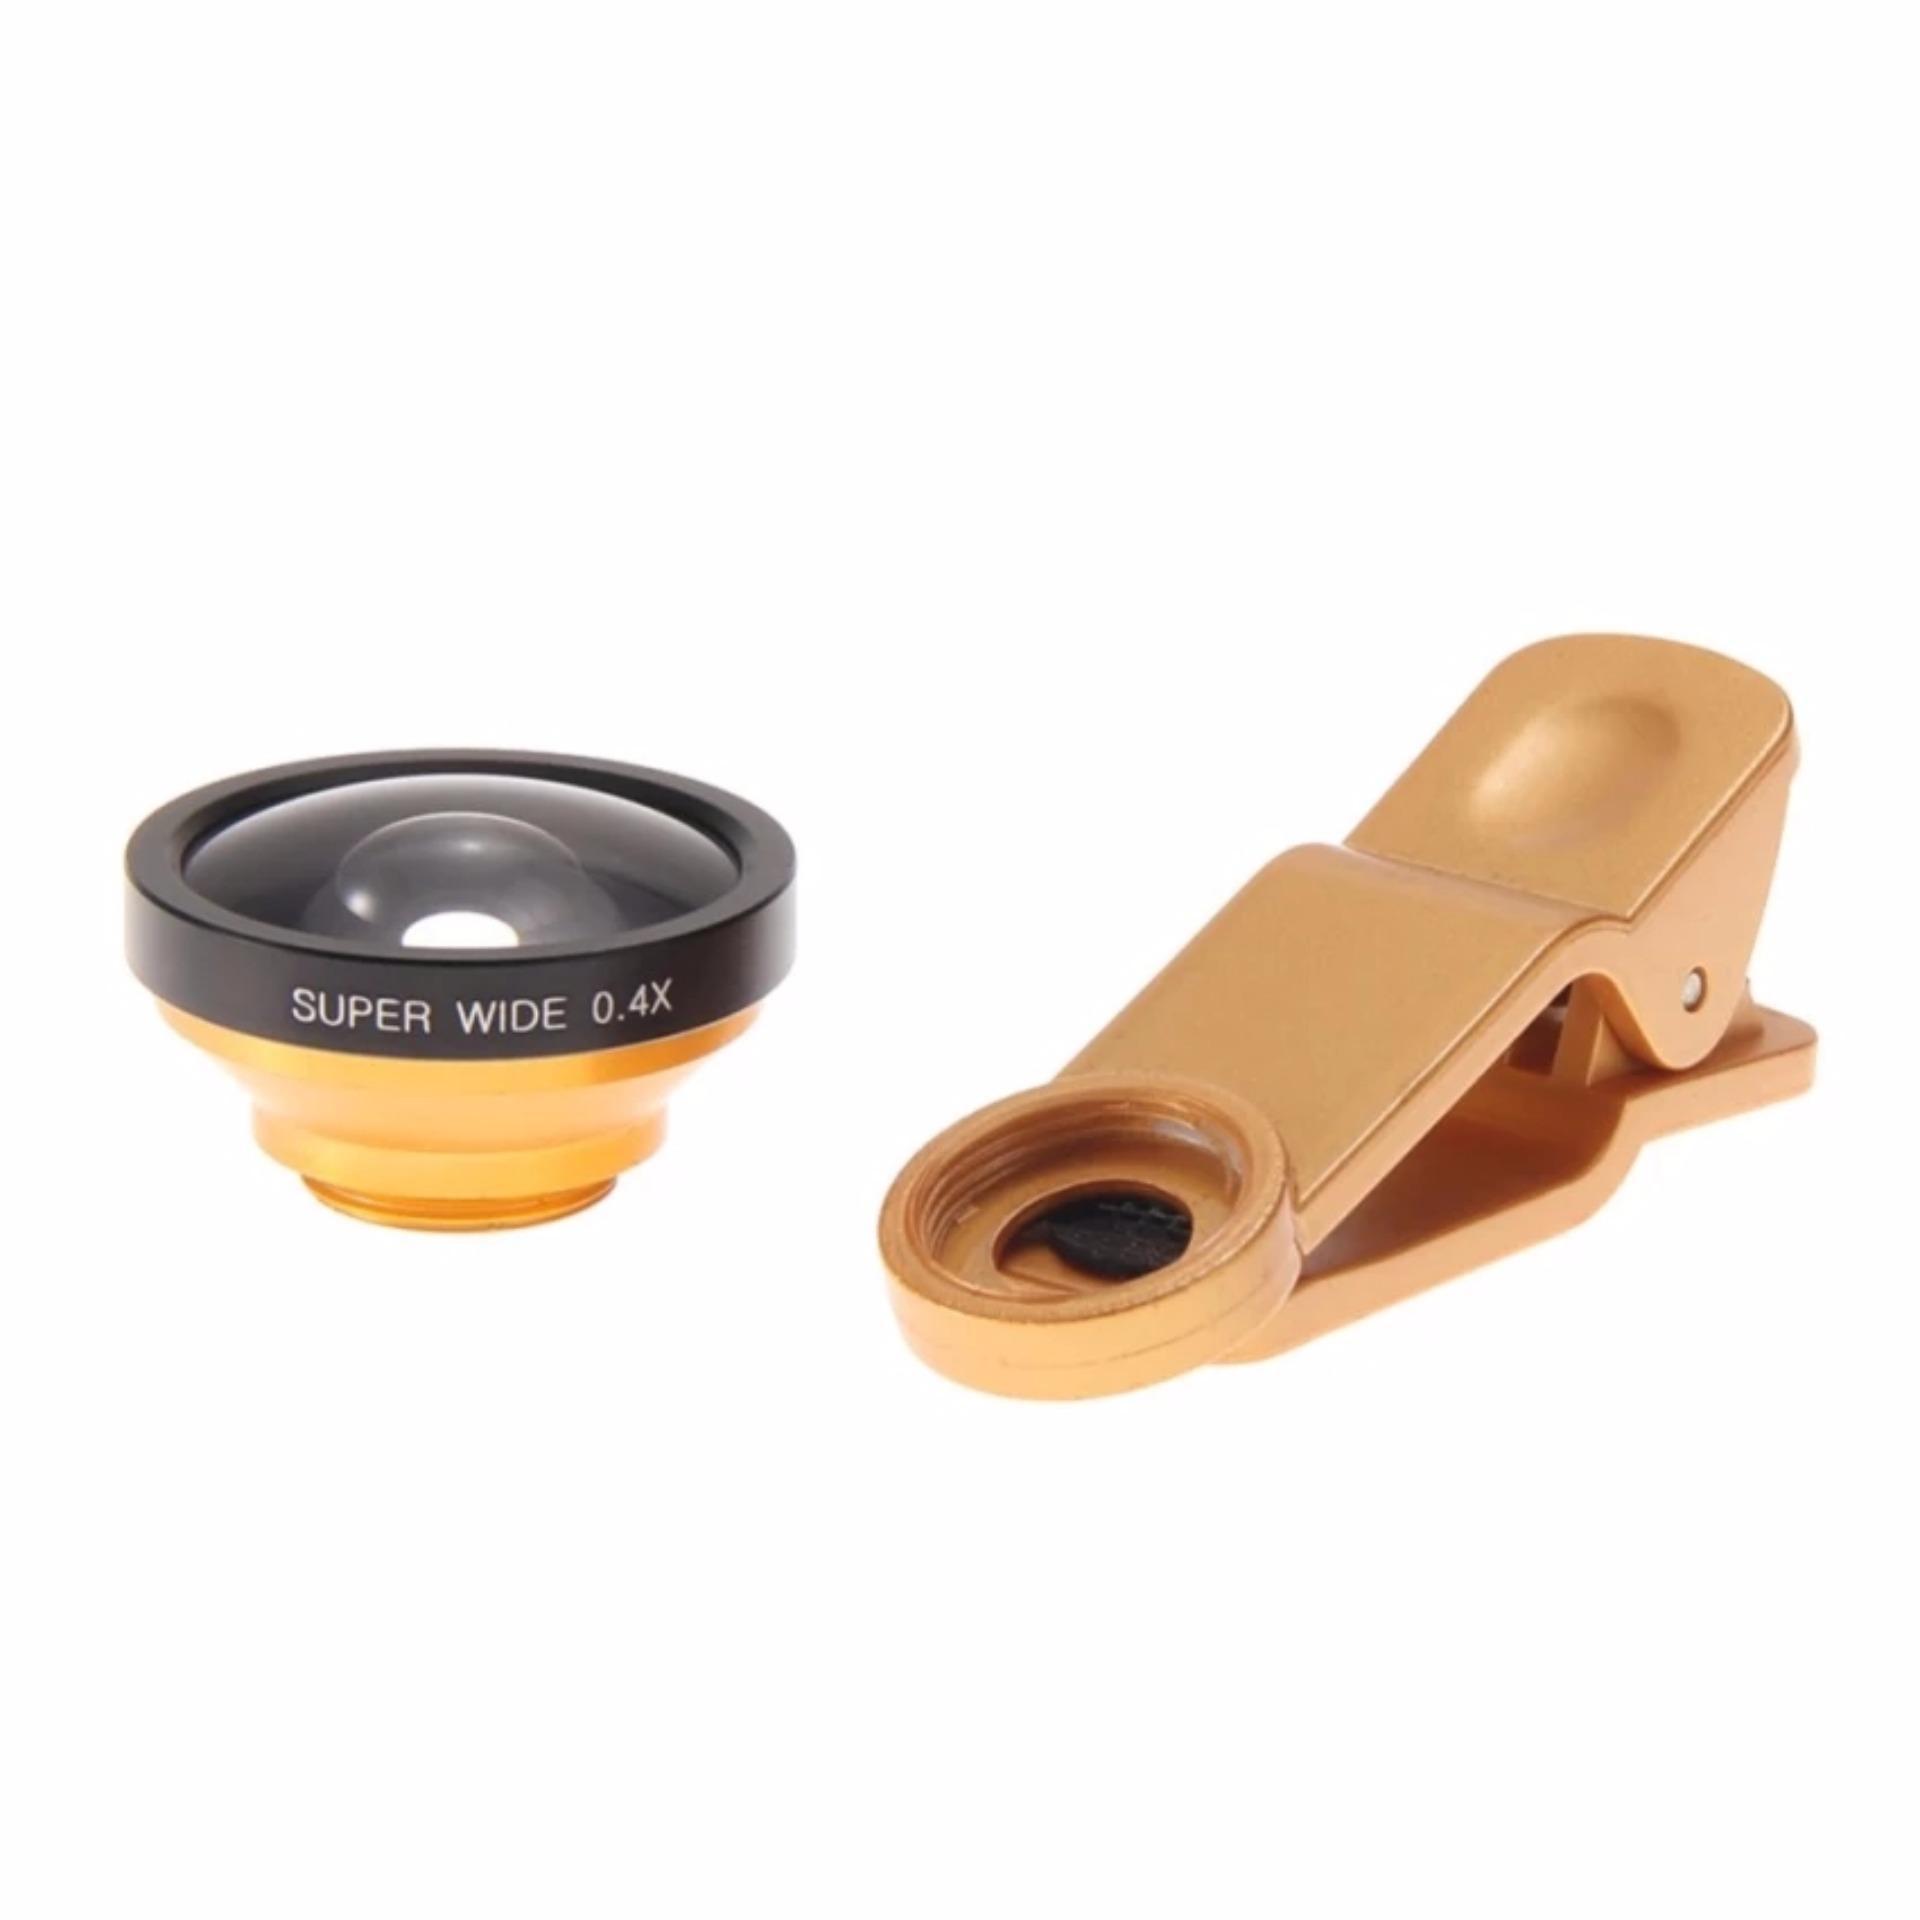 Universal Clip Lens Super Wide 04x U004 235 Hitam Spec Dan Daftar Lensa Superwide Degree With 0 4x Selfie Cam Gold